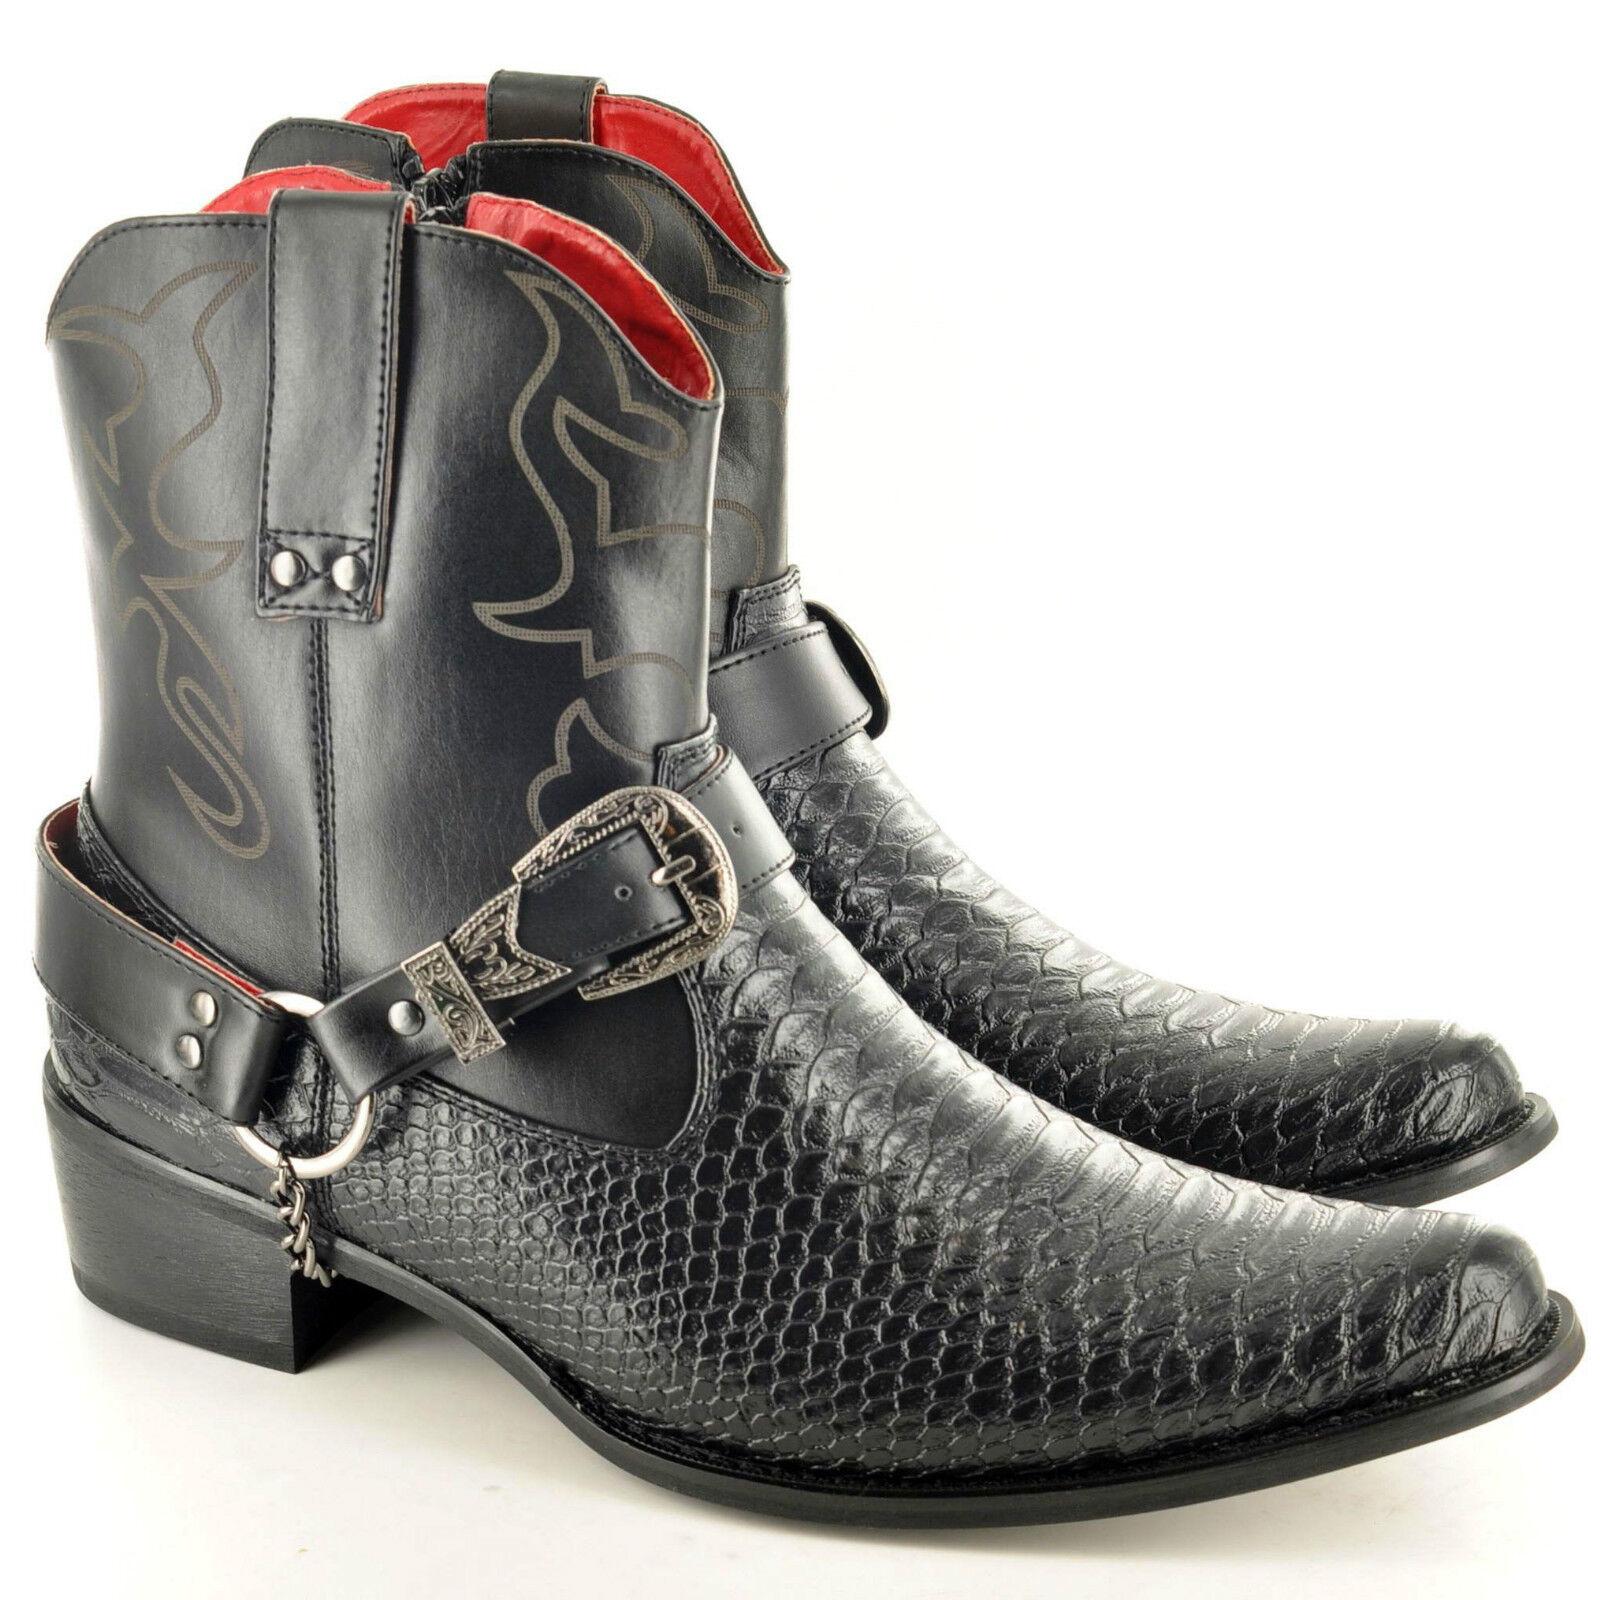 Hombre Hombre Hombre Gents Snake Skin Full Zip Western Cowboy Ankle botas Talla 6 7 8 9 10 11 cbbc84